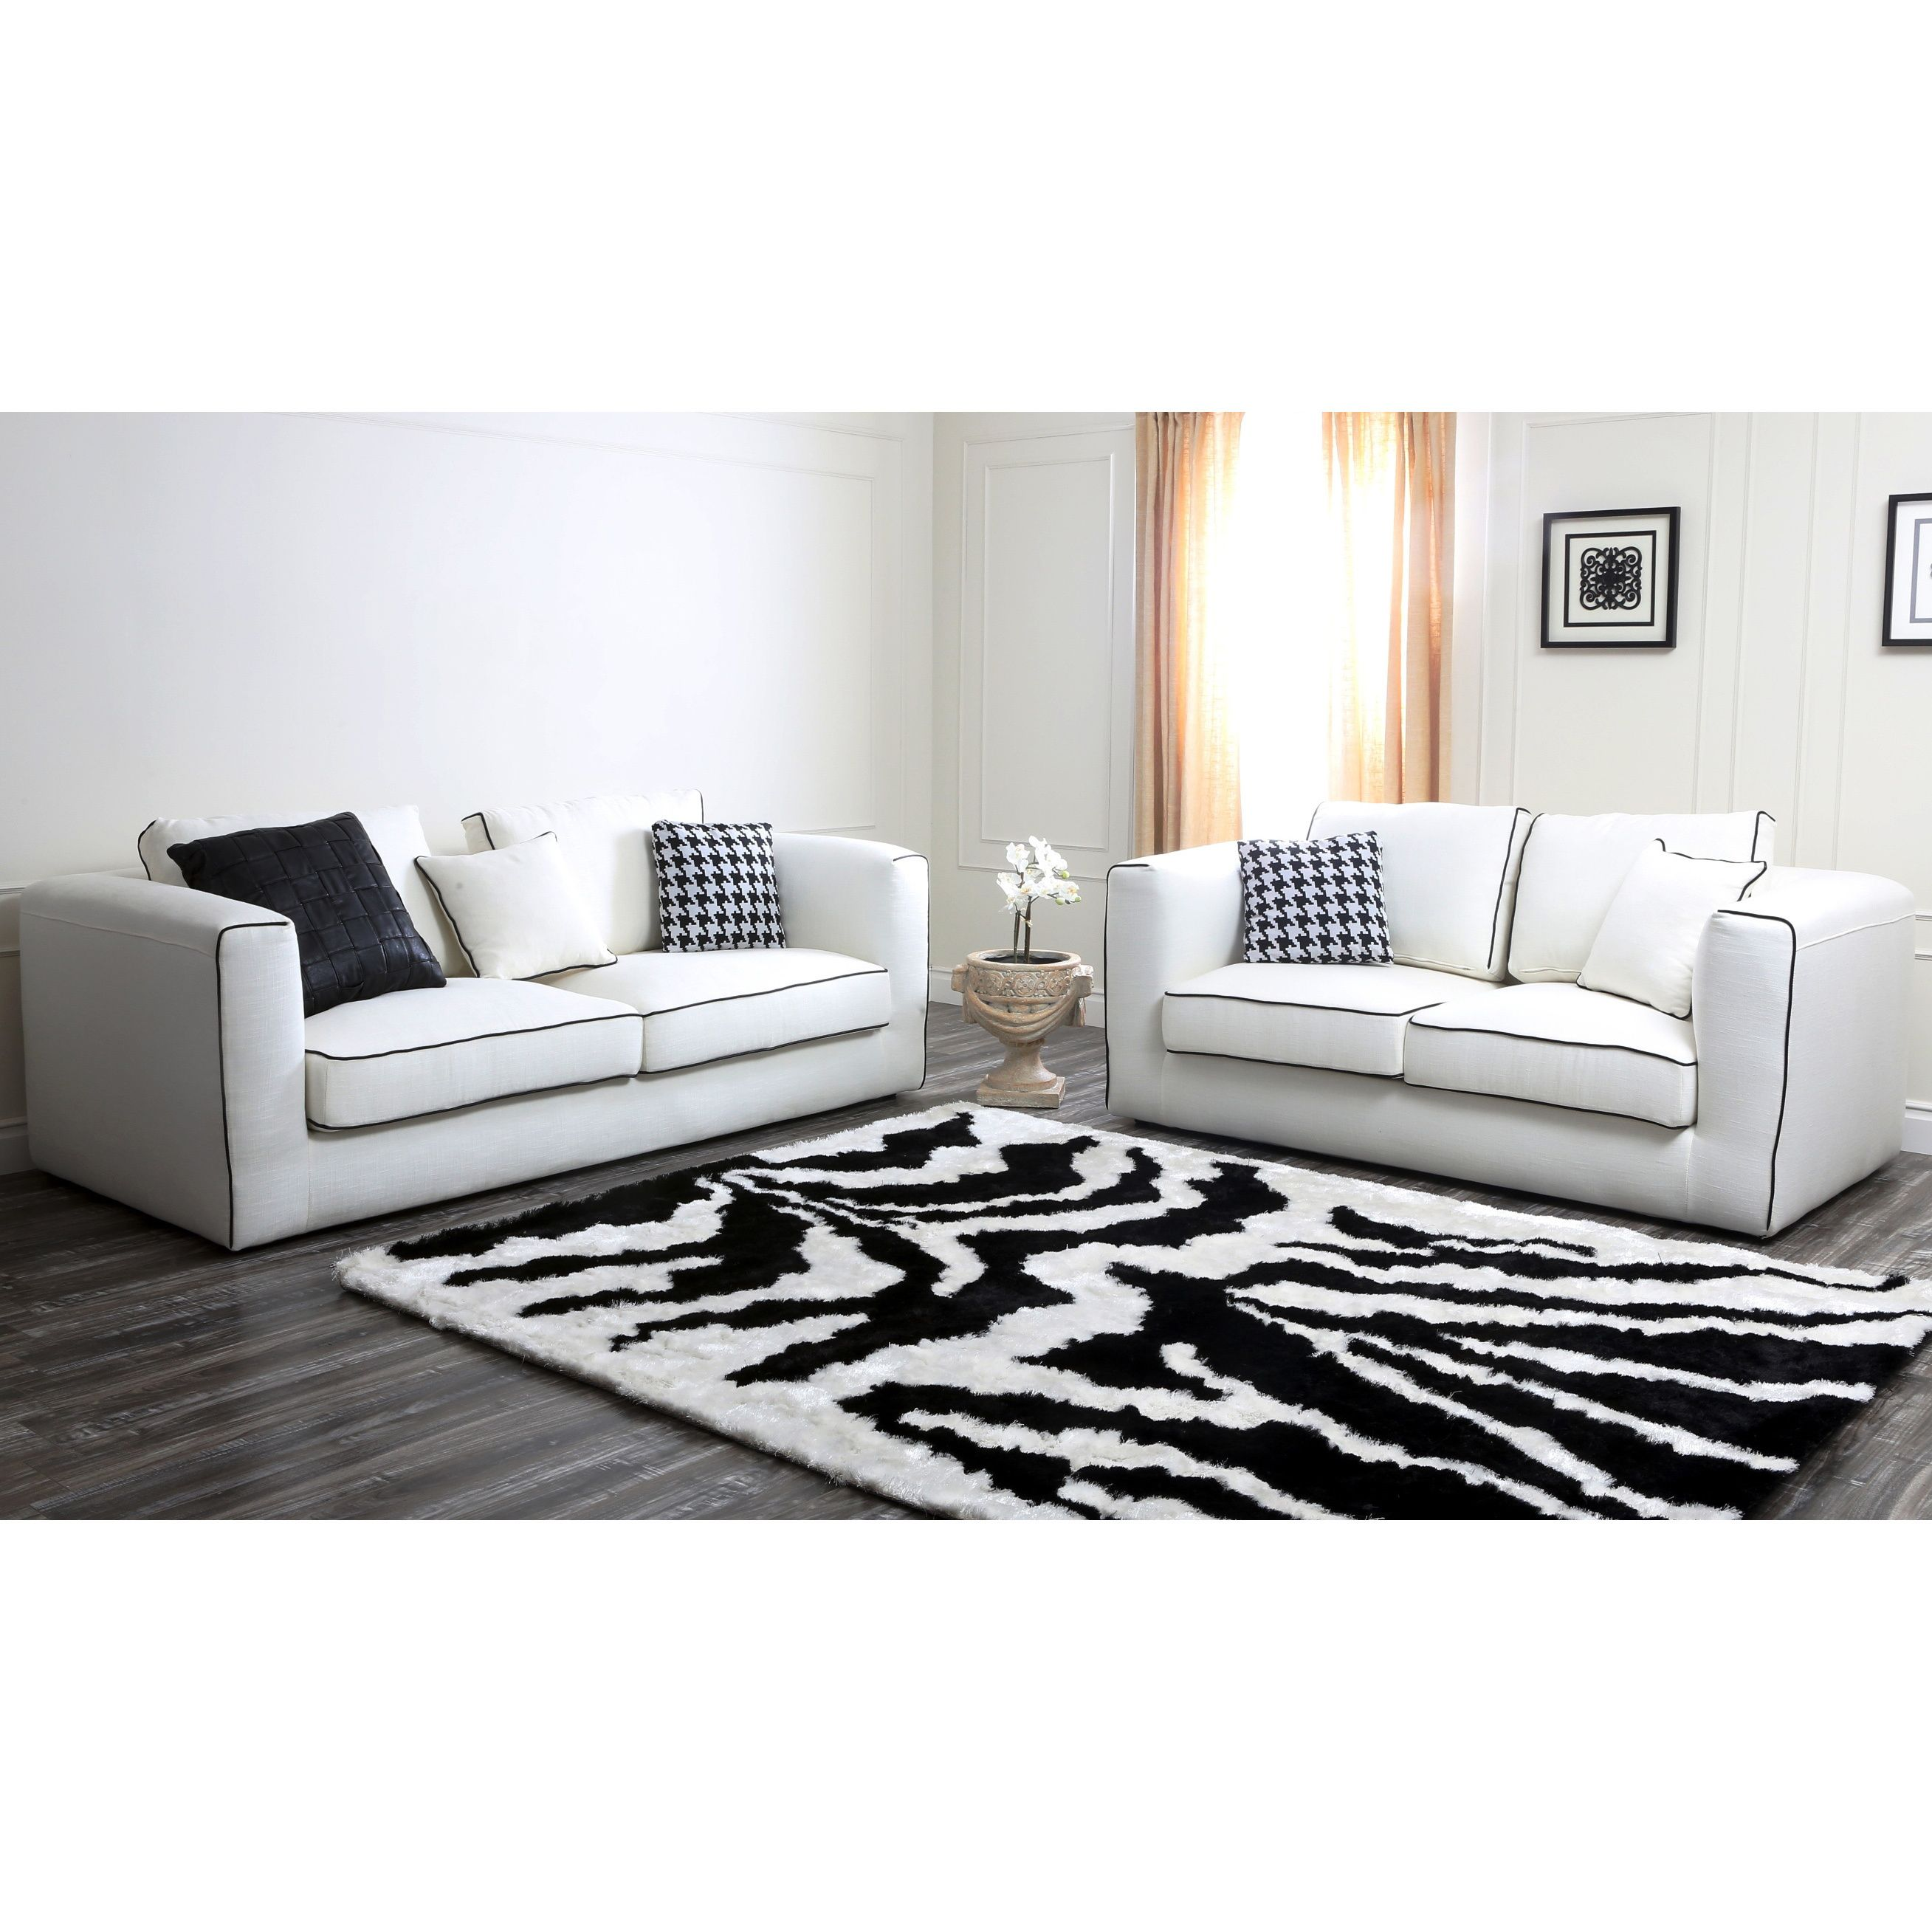 this soho italian linen sofa and loveseat set features fabric